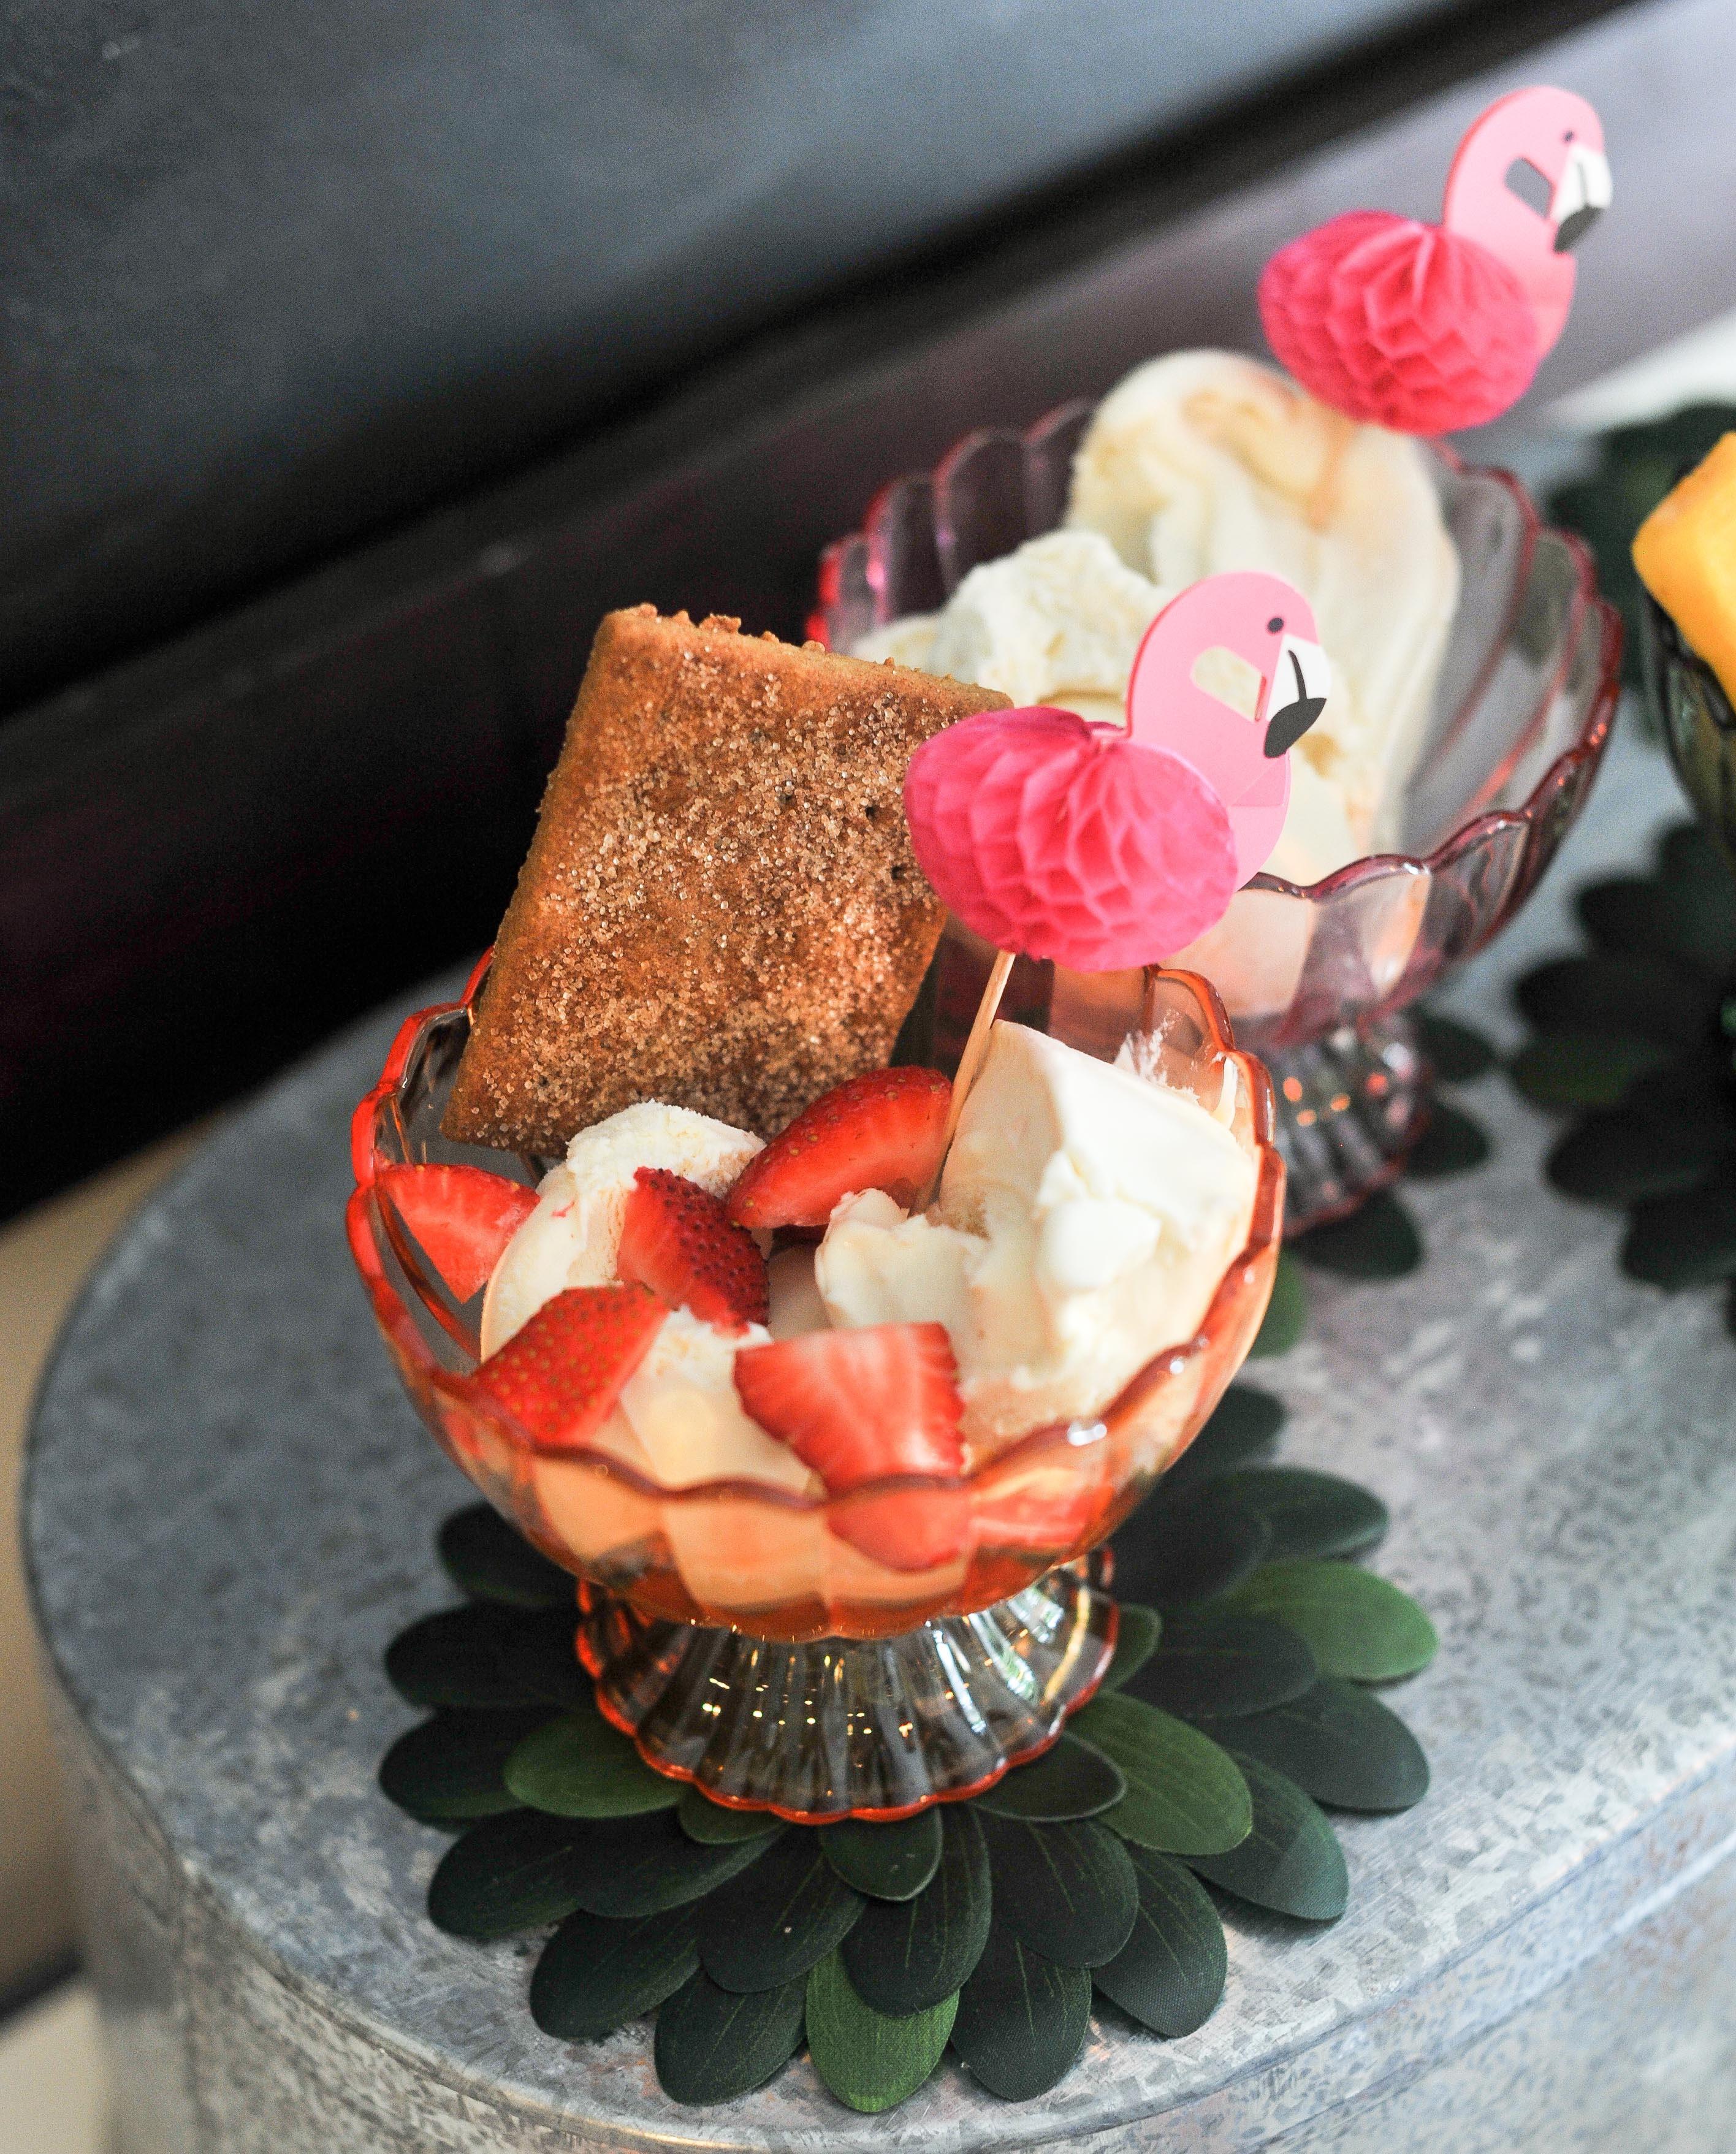 Healthy Ice Cream Bar by Atlanta blogger Happily Hughes